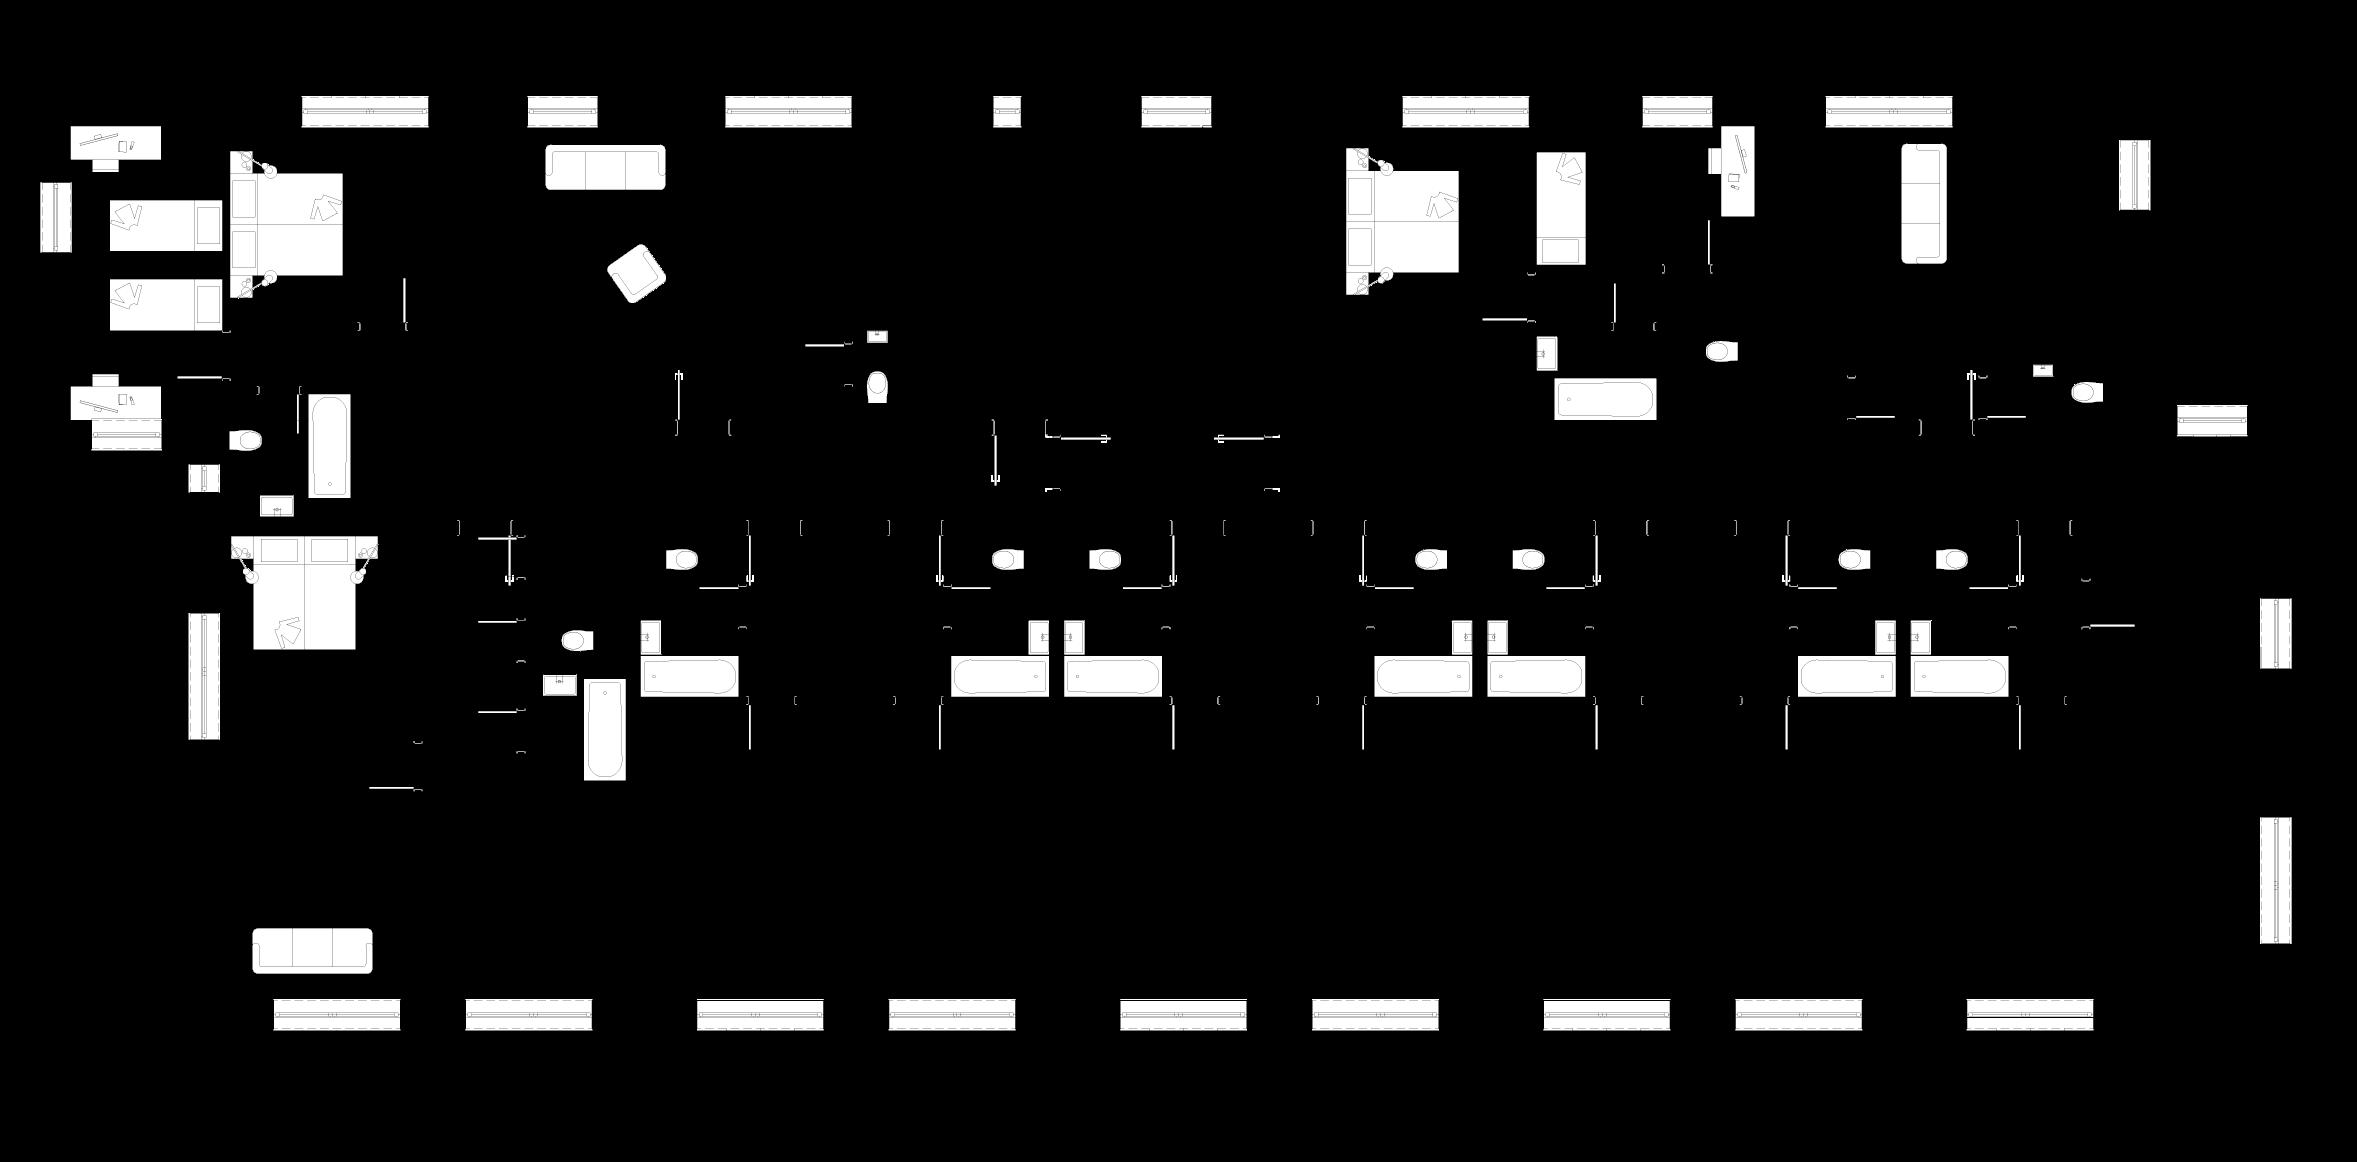 SO-01.A1 – 1. NP – Nova